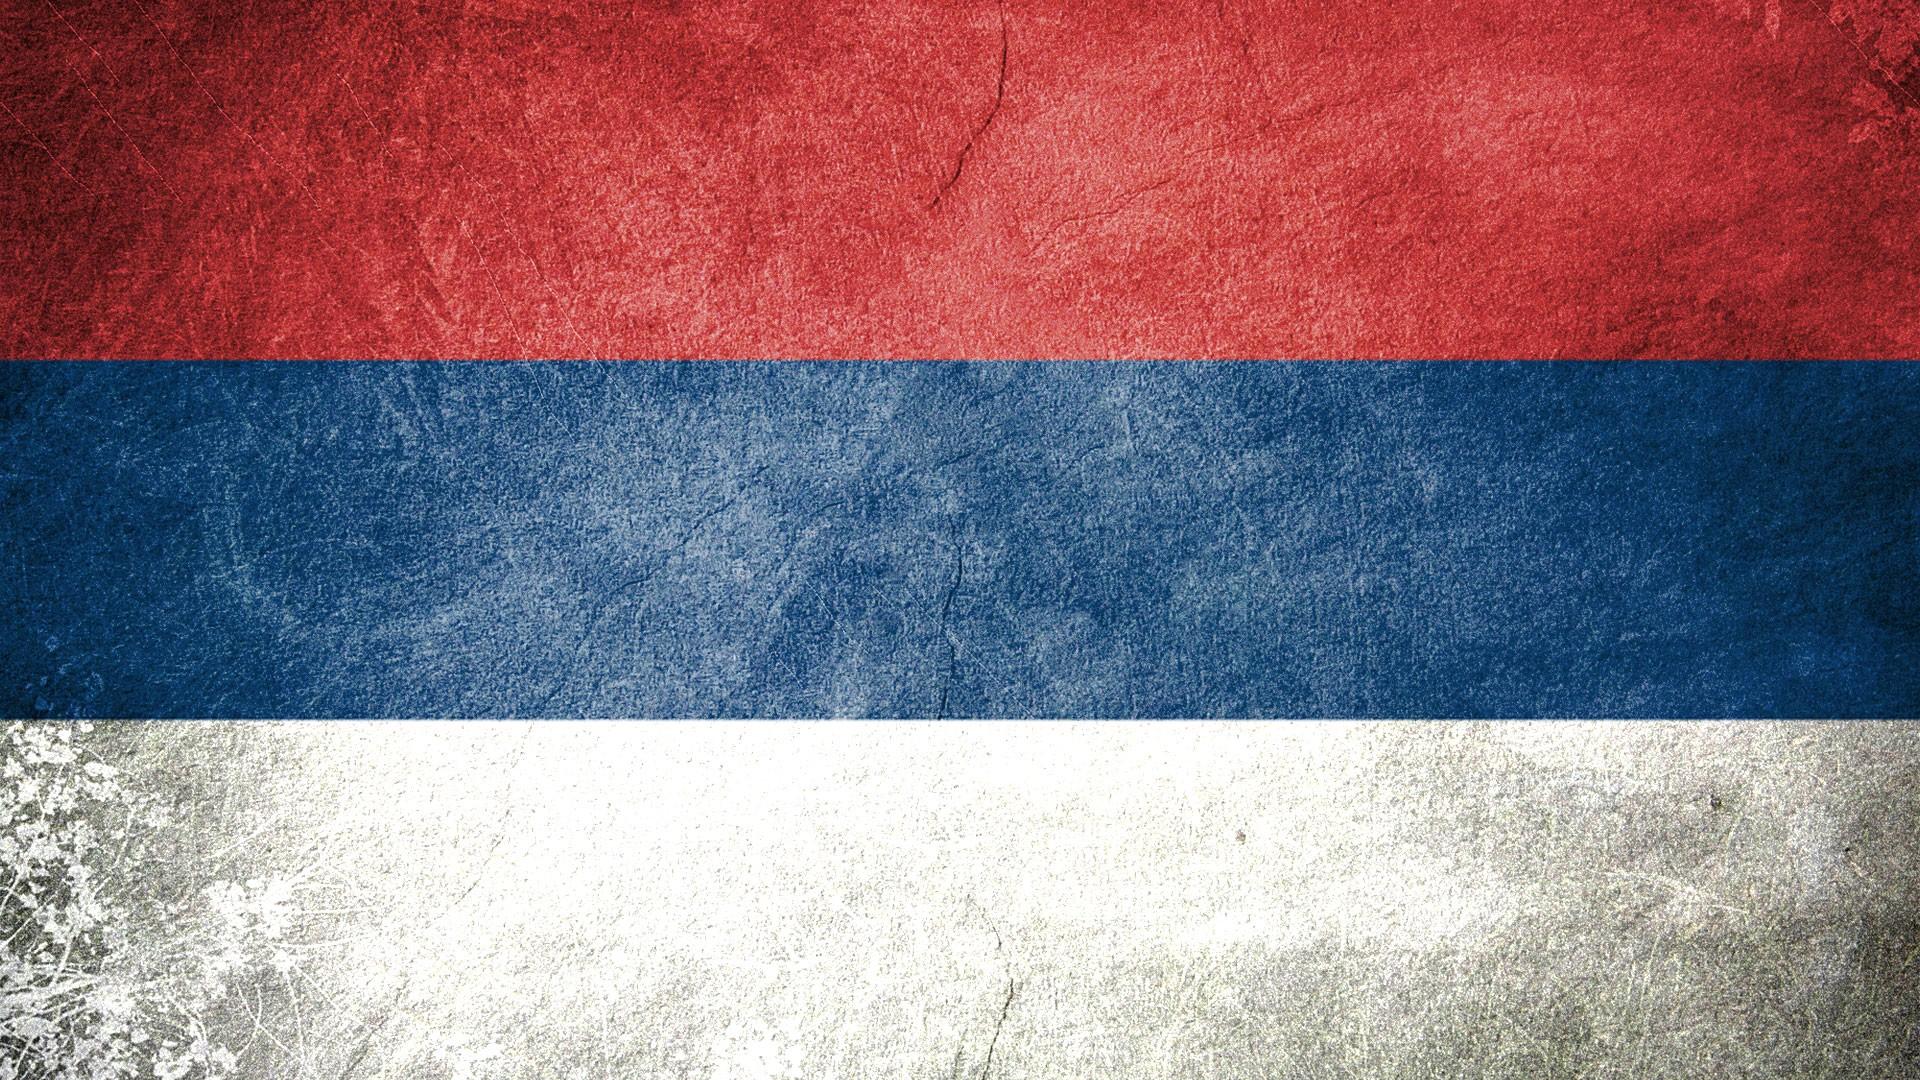 Serbia Wallpaper 1920x1080 Flags Serbia Serbian Civil Flag Serbia 1920x1080